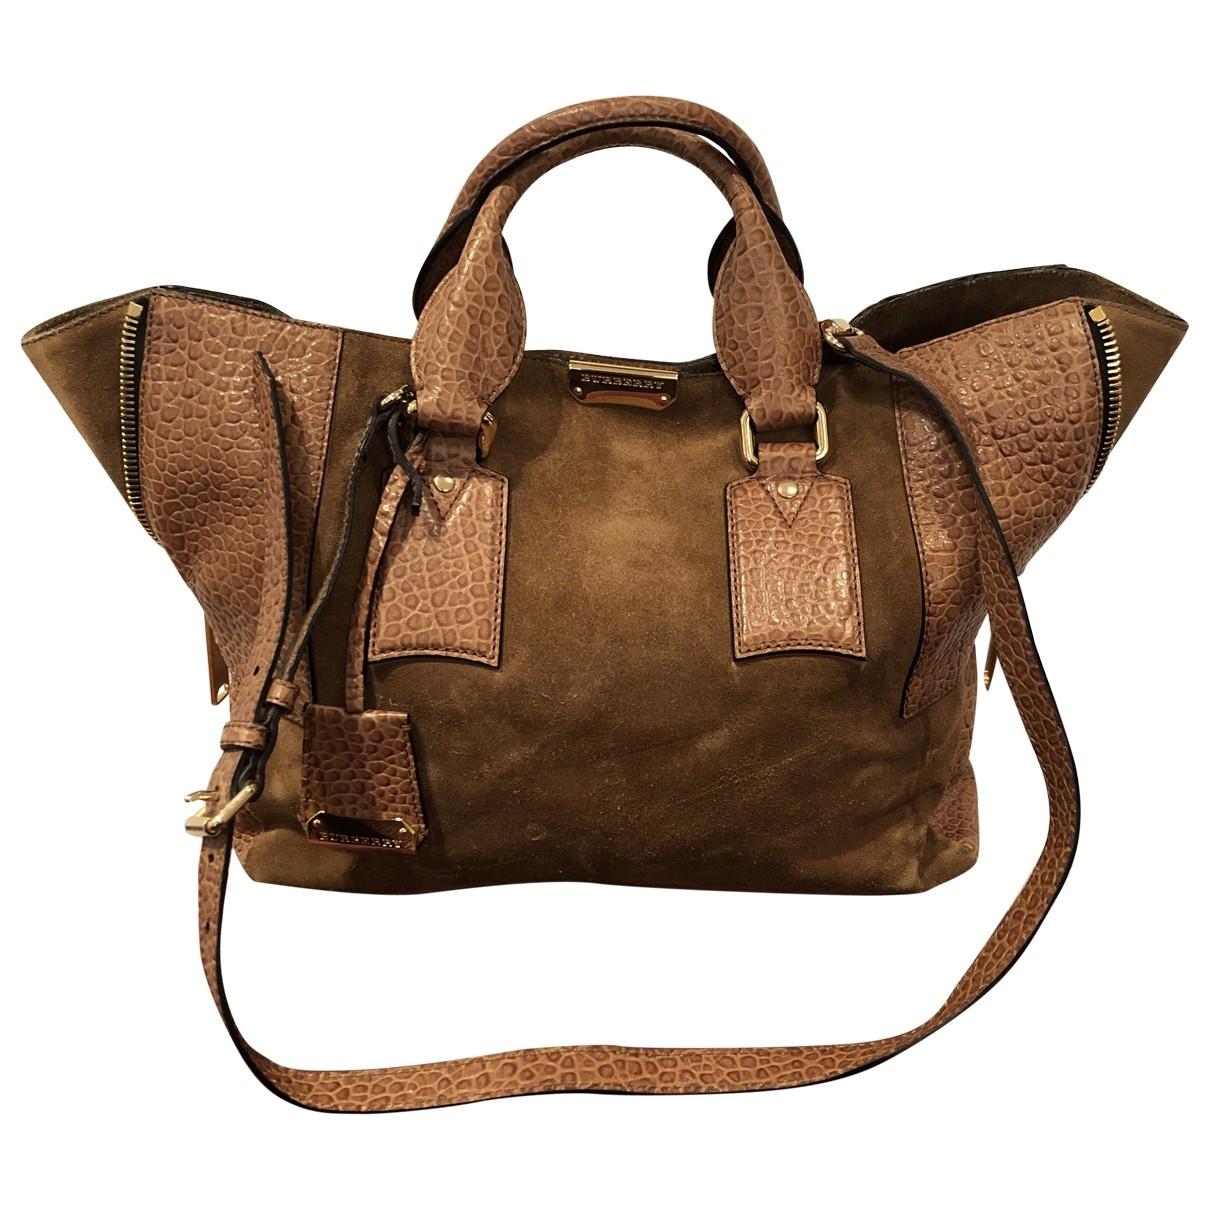 Burberry \N Handtasche in  Kamel Veloursleder